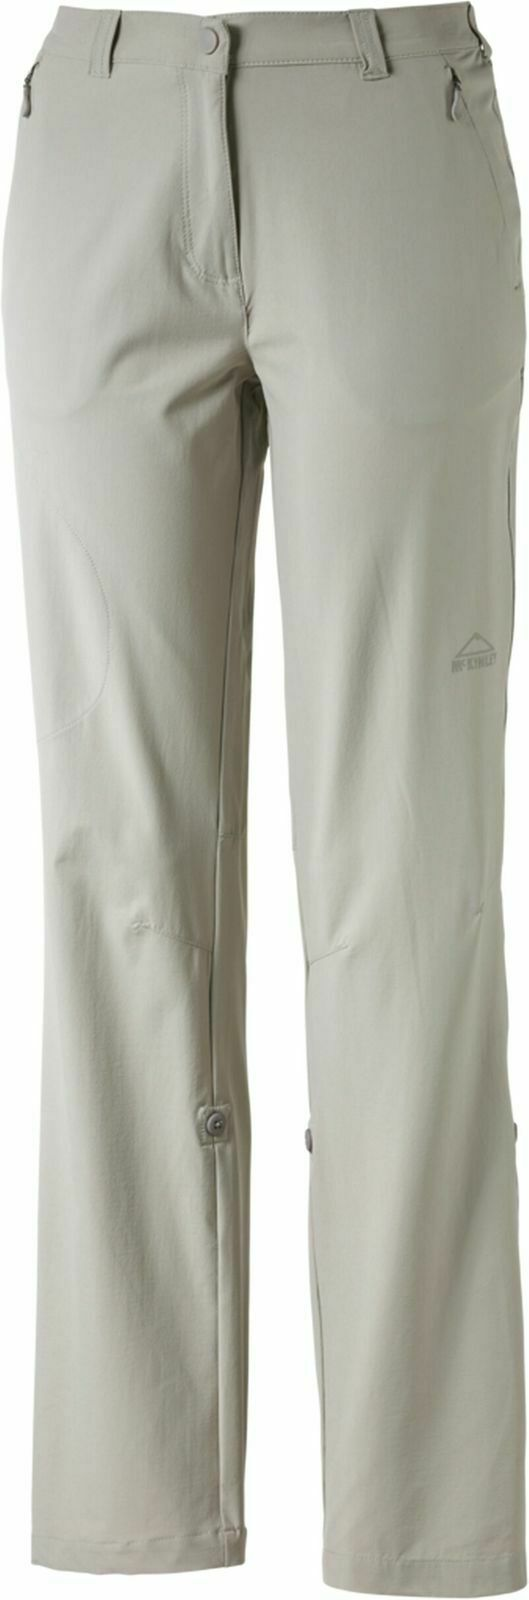 Mckinley damen Pantaloni per Escursioni Trekking Madok grau Größe Lunga